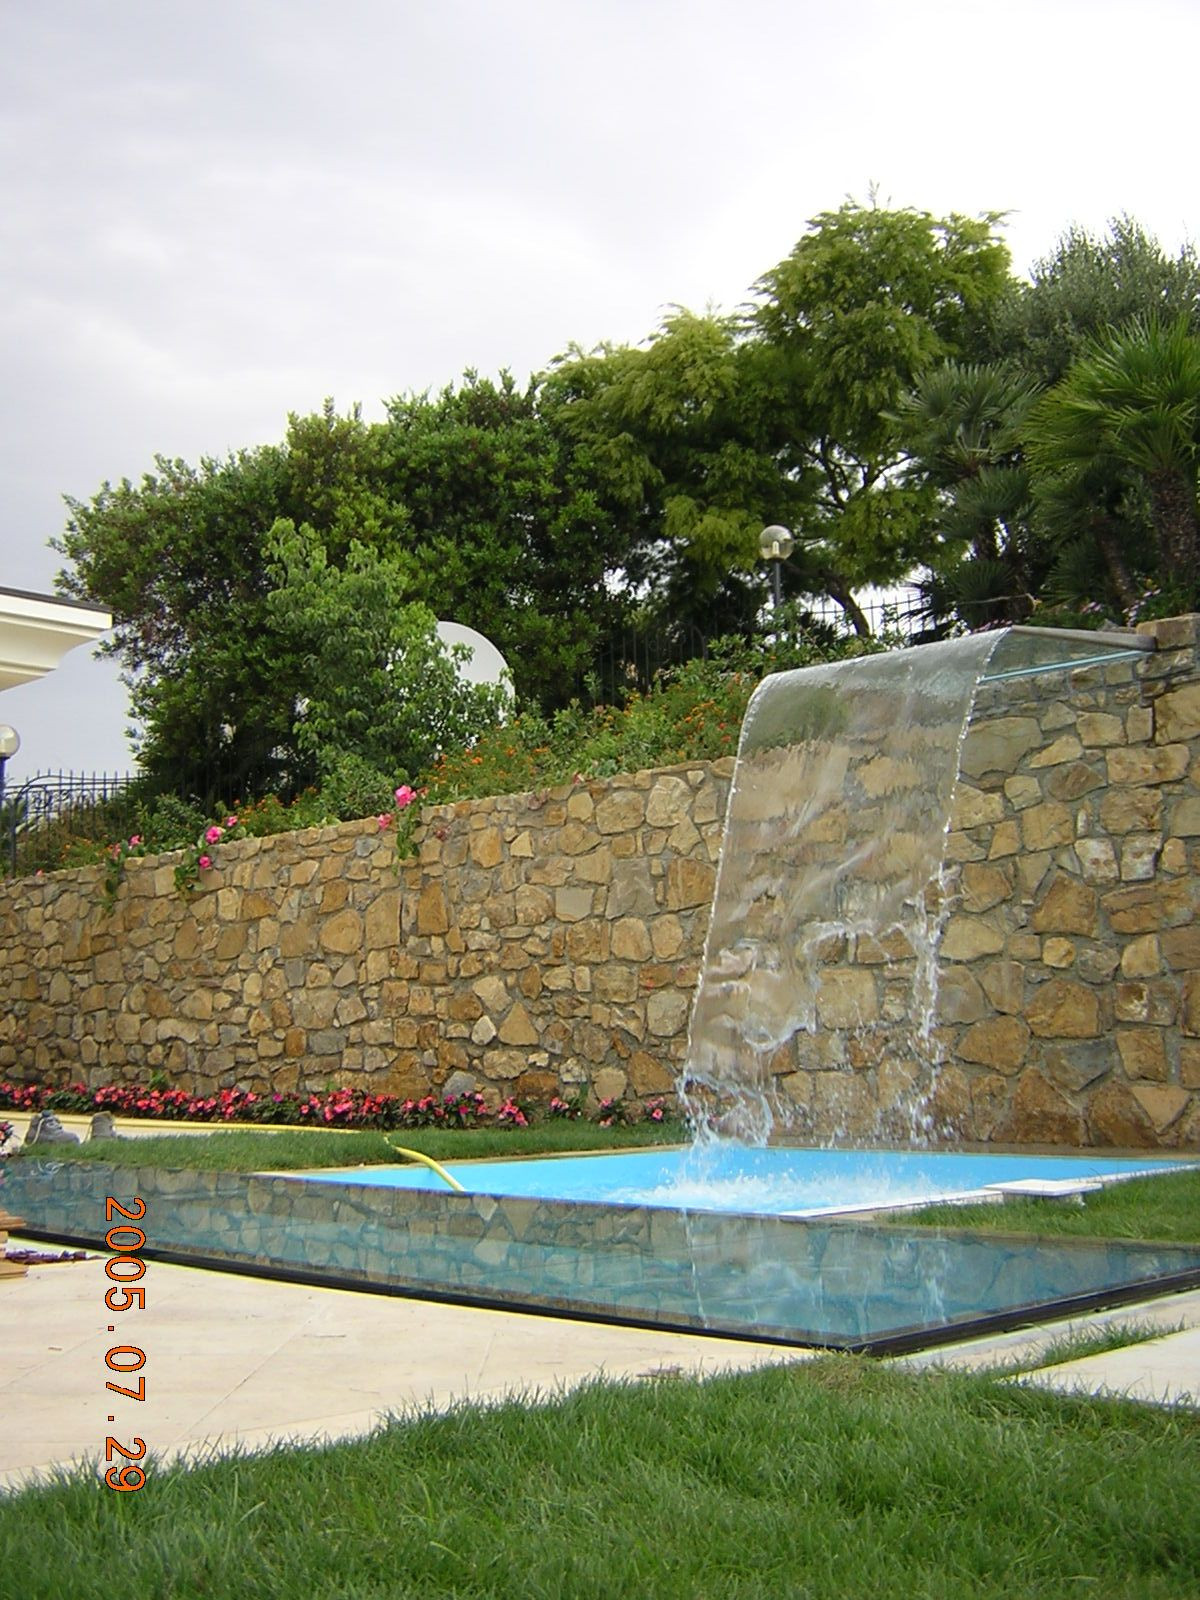 Cascata e pavimento piscina in vetro Bordighiera (Có hình ảnh)